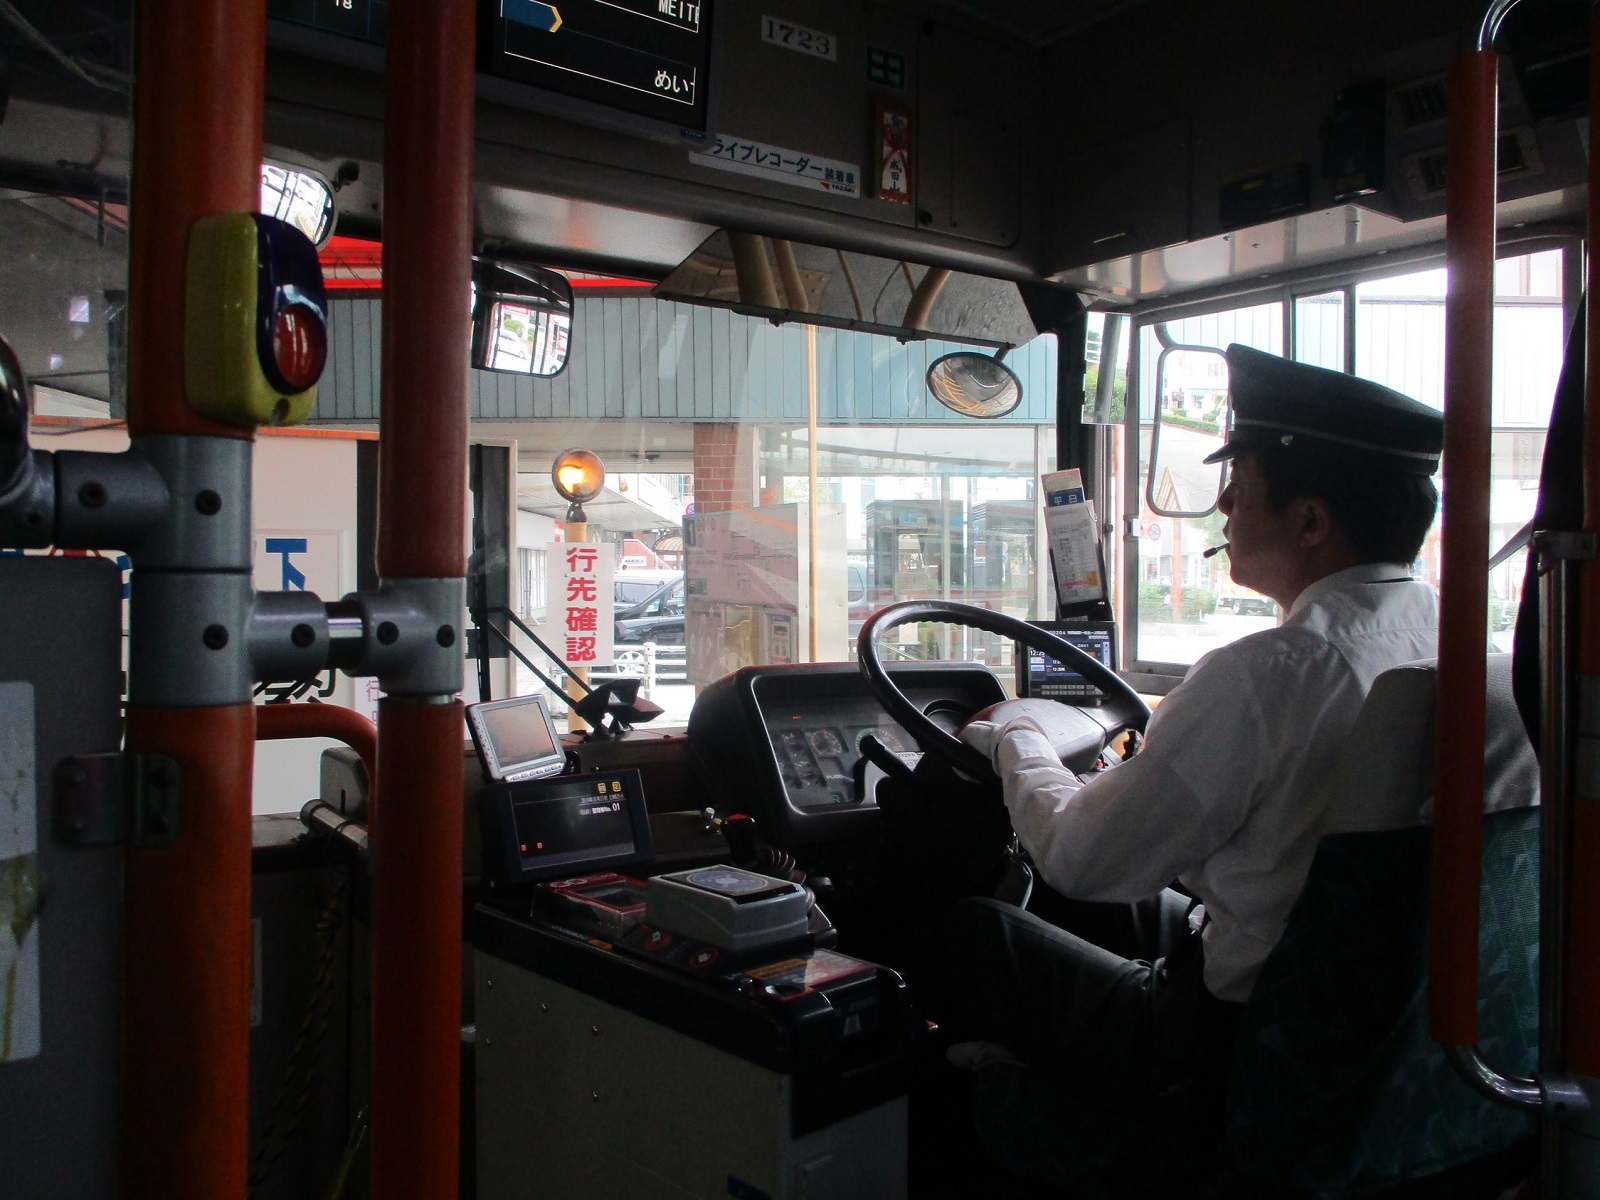 2019.10.17 (3) JR岡崎駅いきバス - 東岡崎 1600-1200